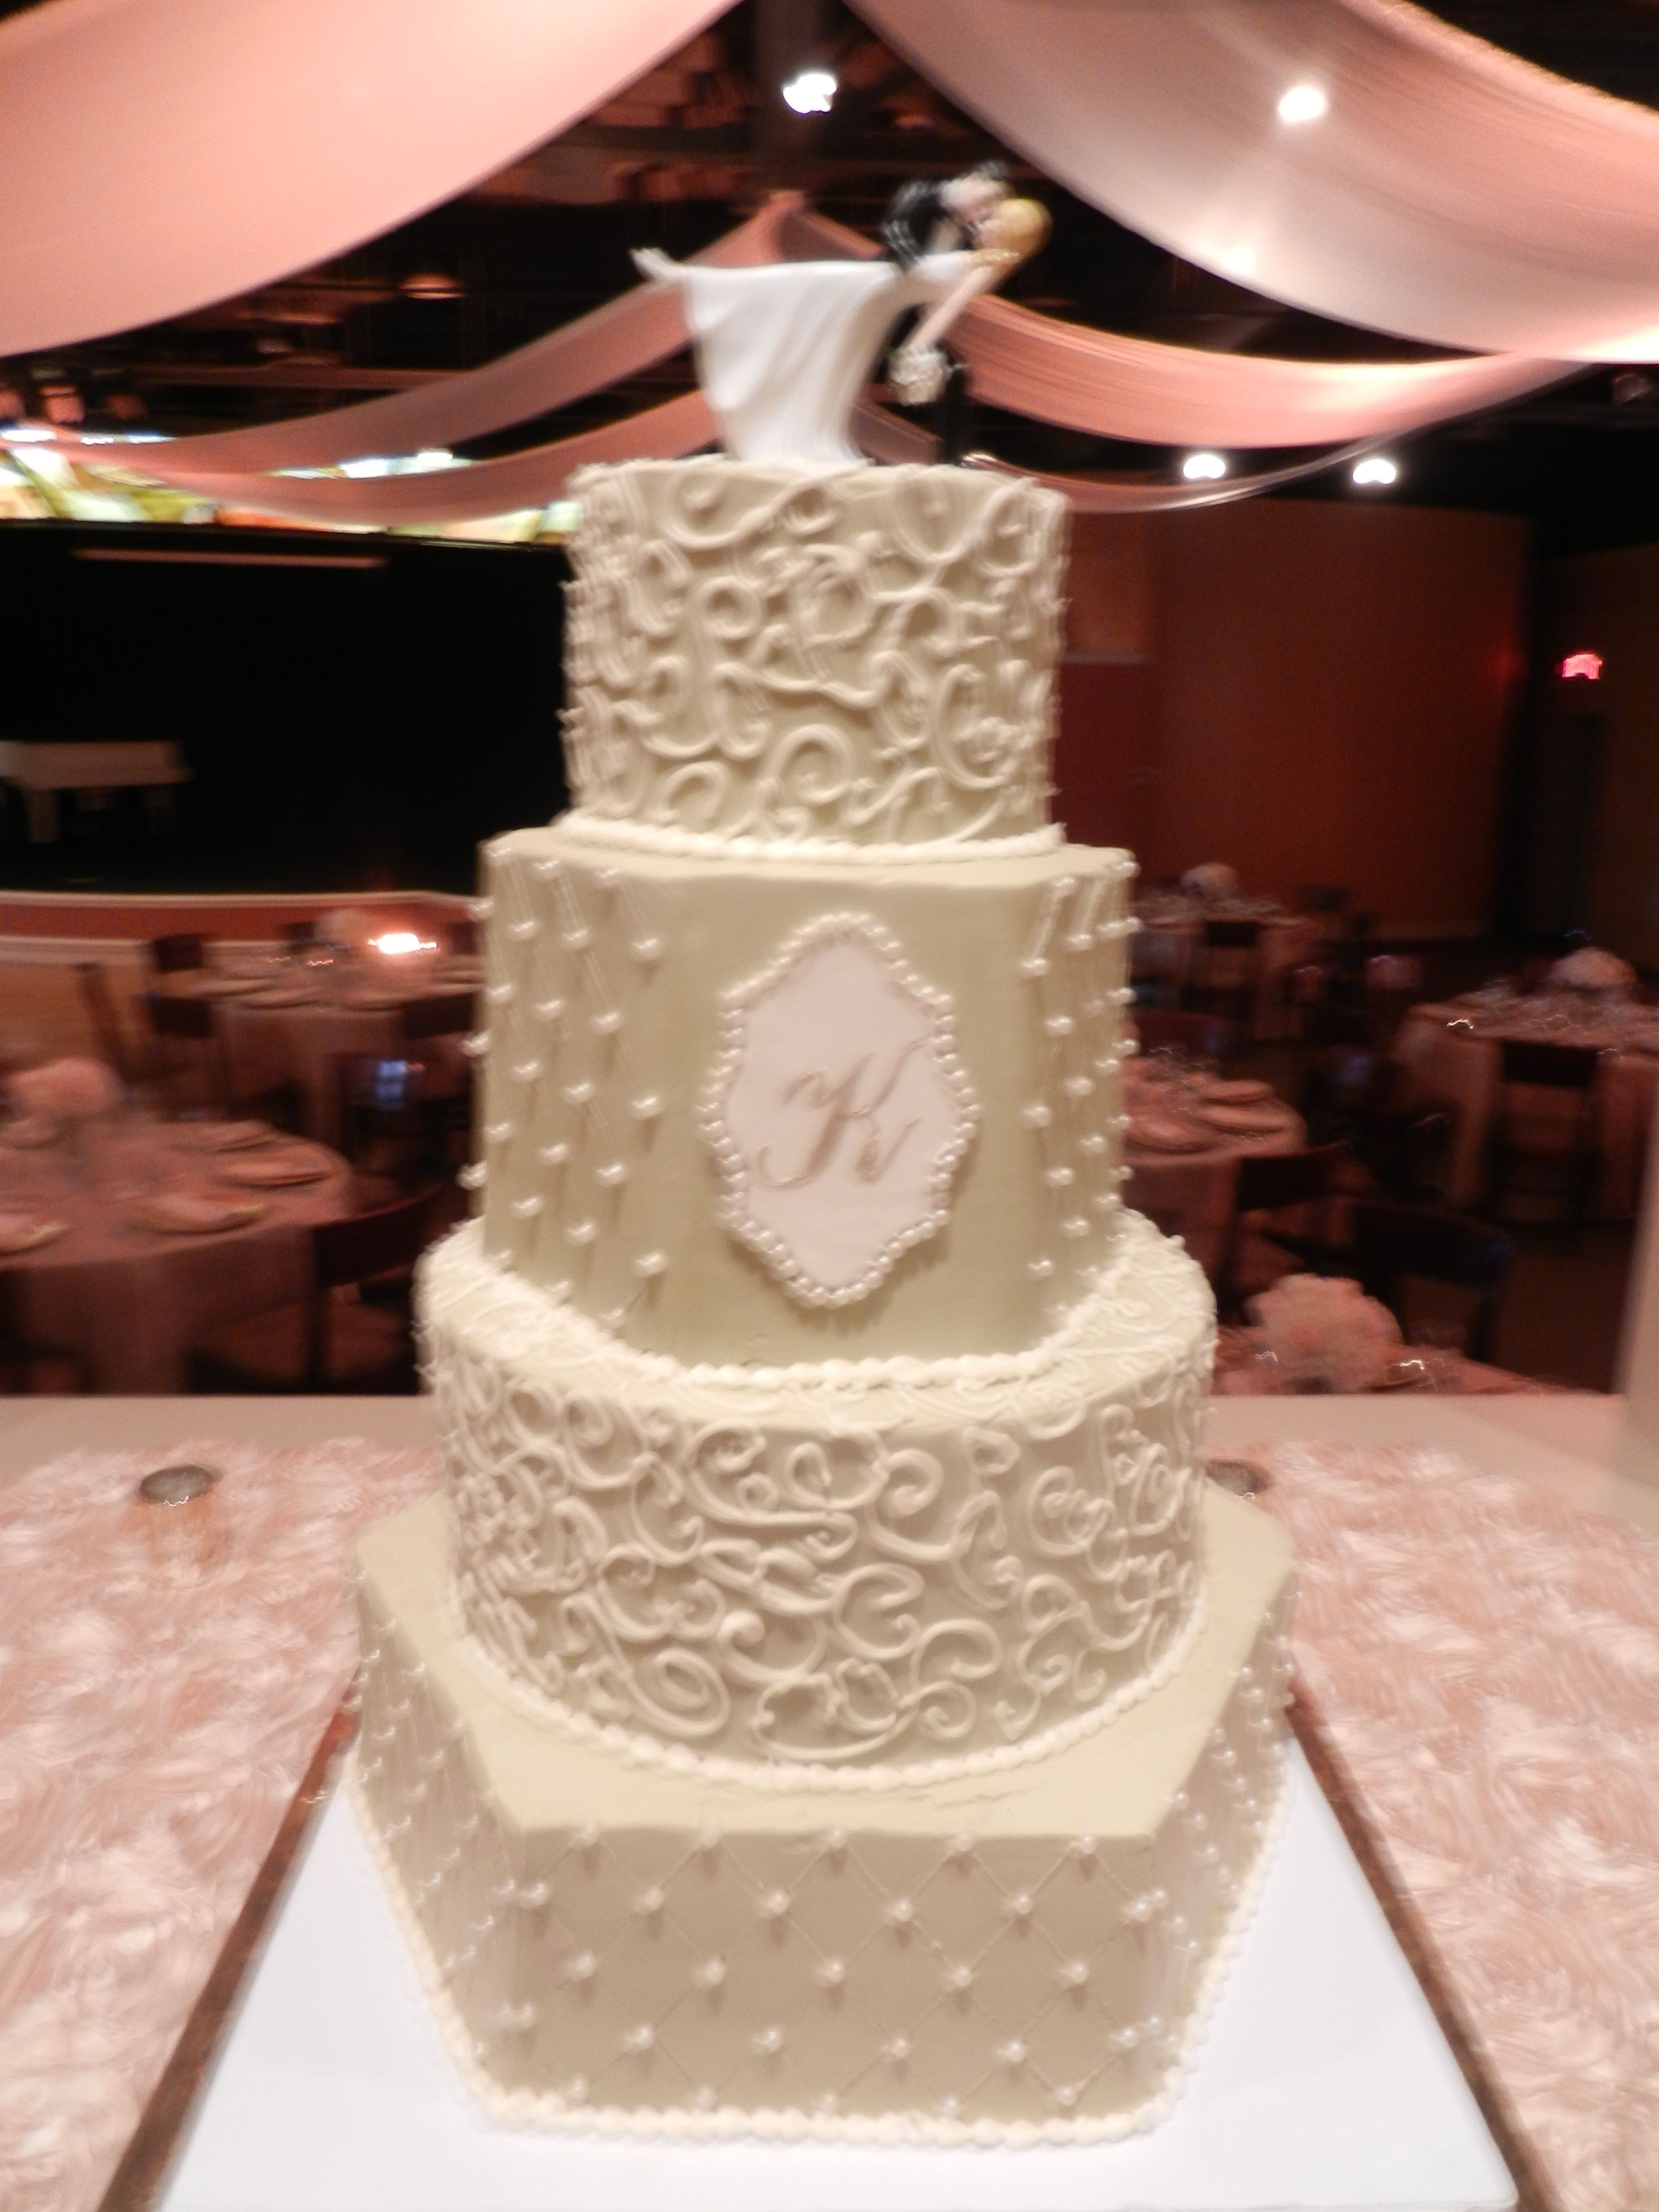 Www.cheesecakeetc.biz Wedding Cakes Charlotte NC Champagne Hex Wedding Cake  With Monogram